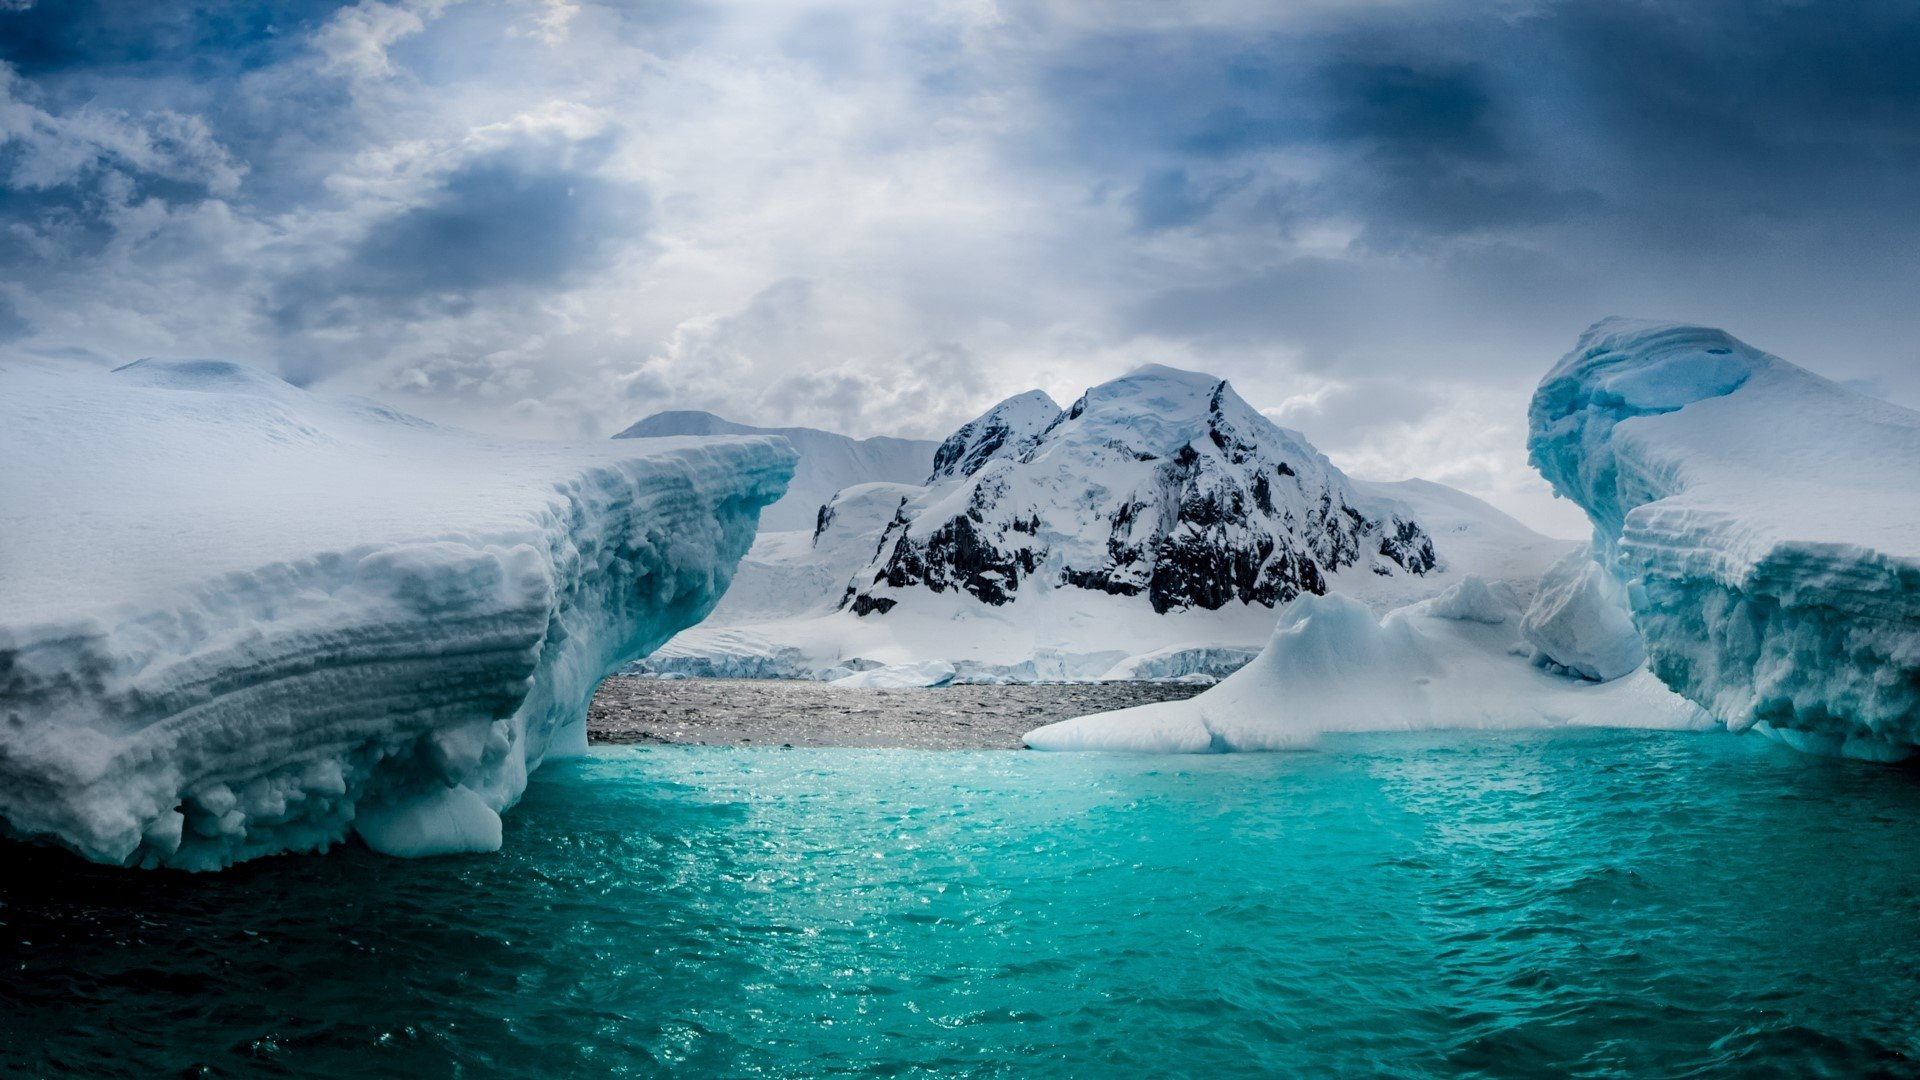 halfmoon island in antarctica full hd wallpaper and